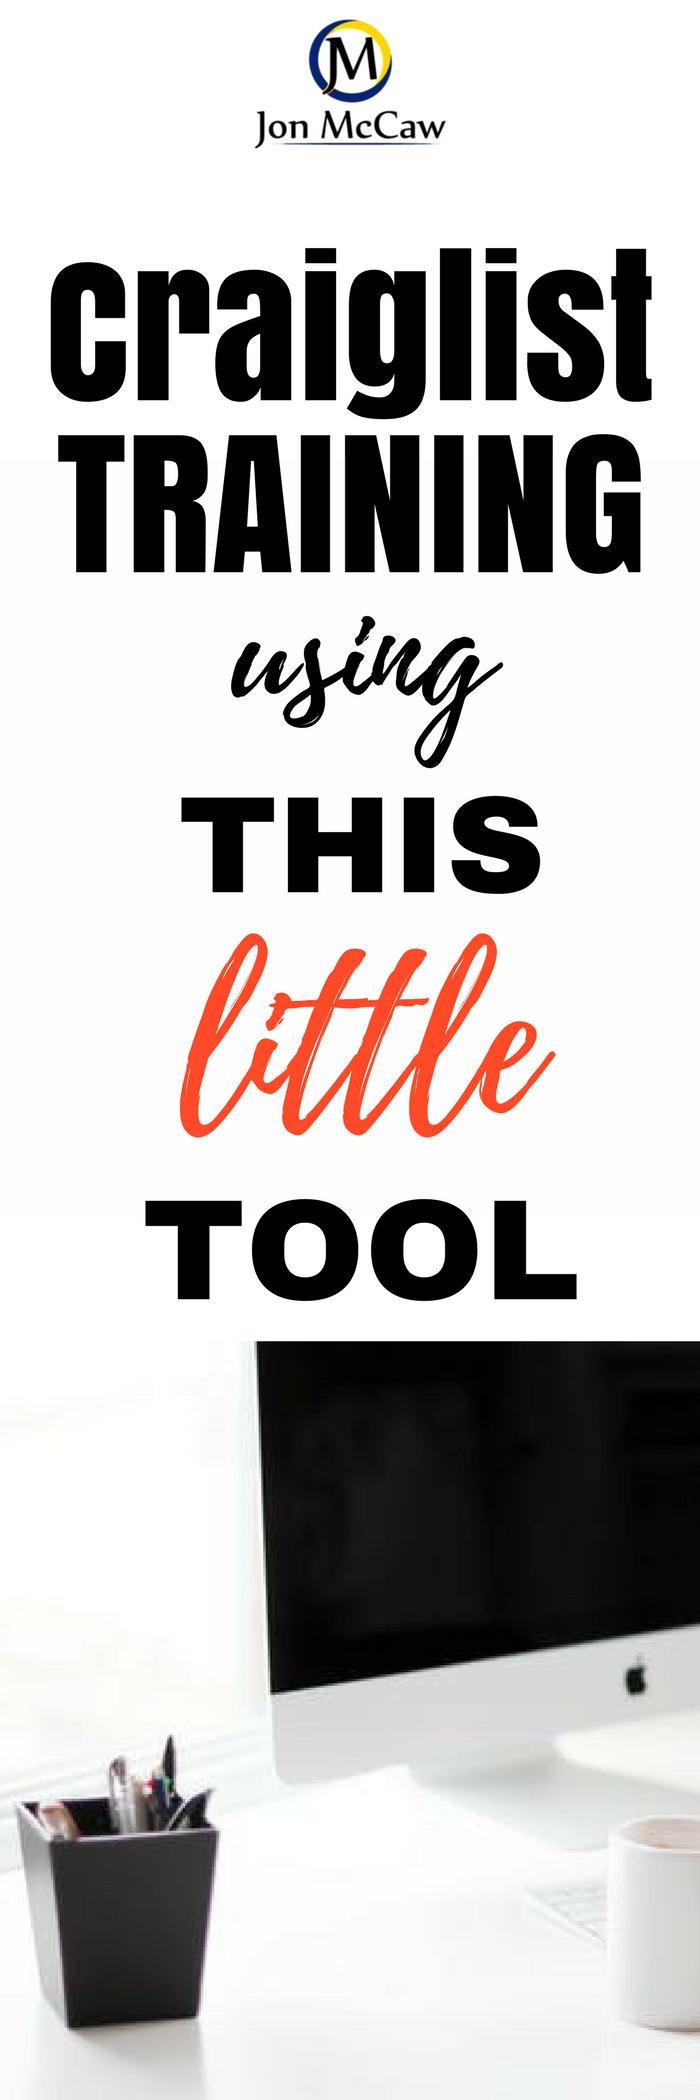 Craigslist Training Using GetResponse